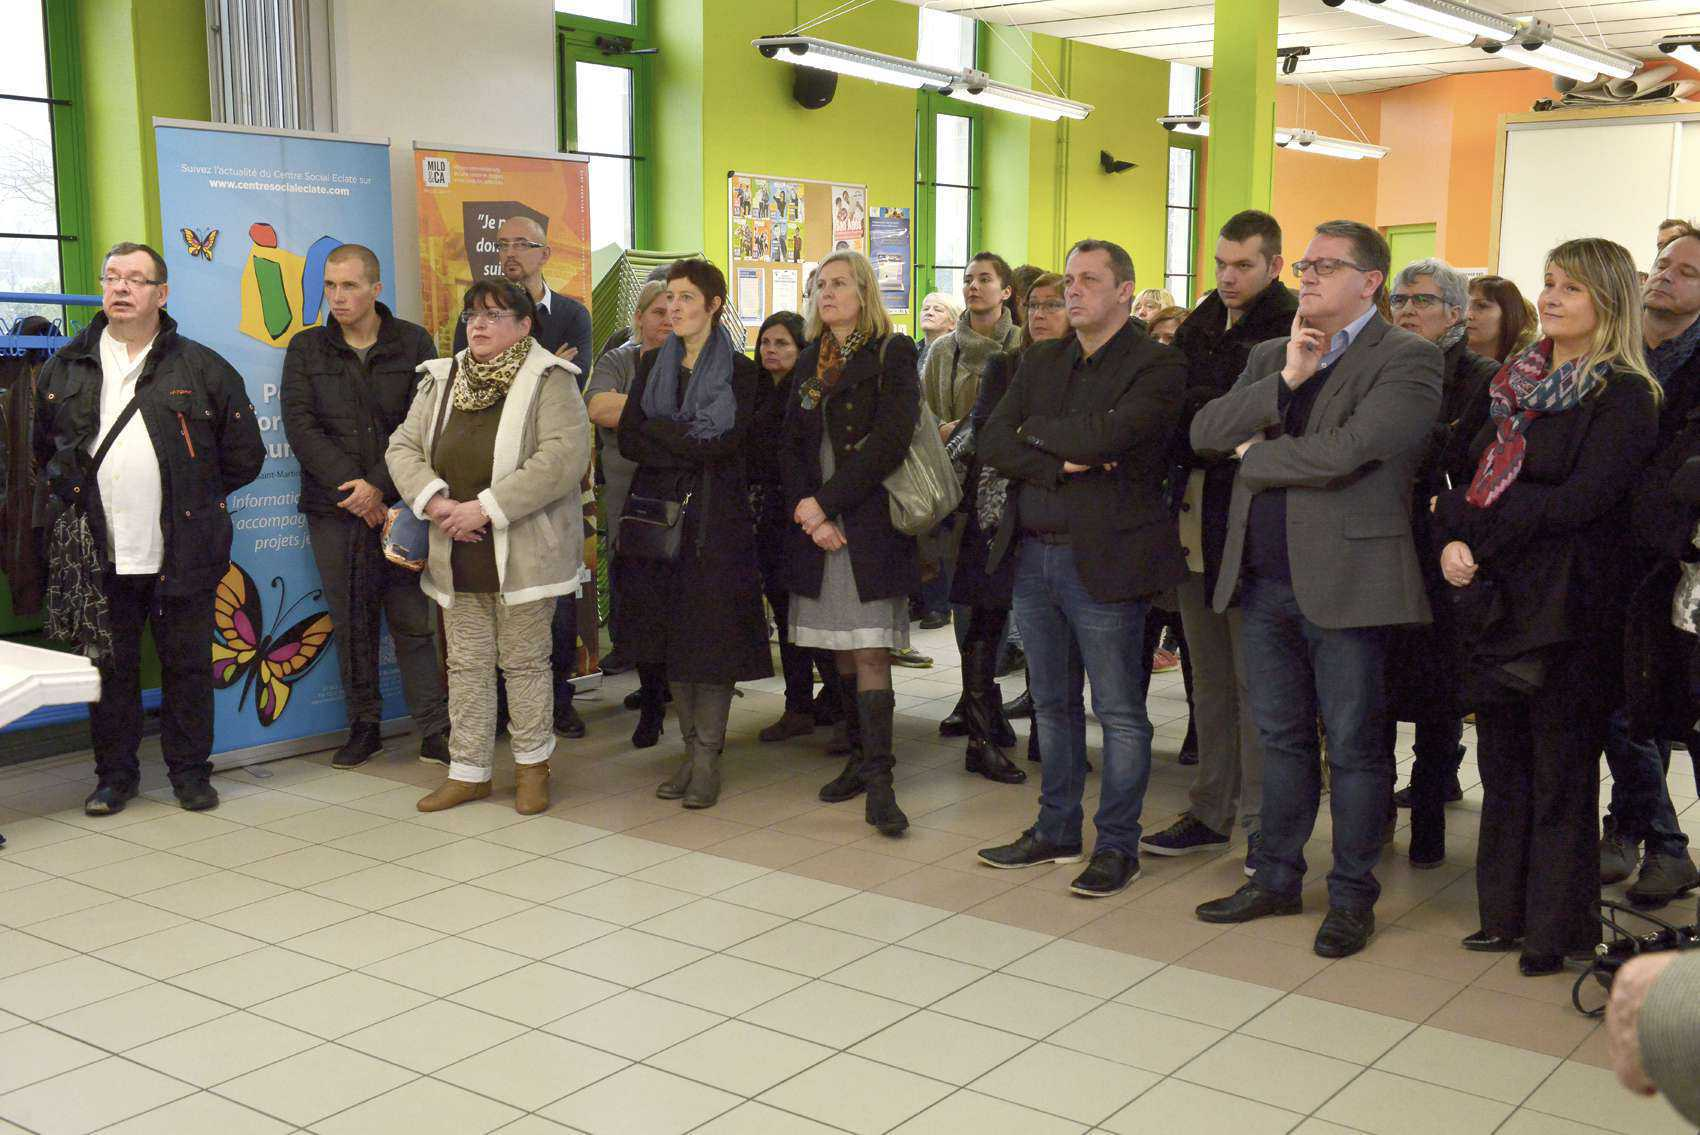 centresocialeclate.centres-sociaux.fr/files/2016/01/centre-social-eclate-saint-martin-boulogne-9